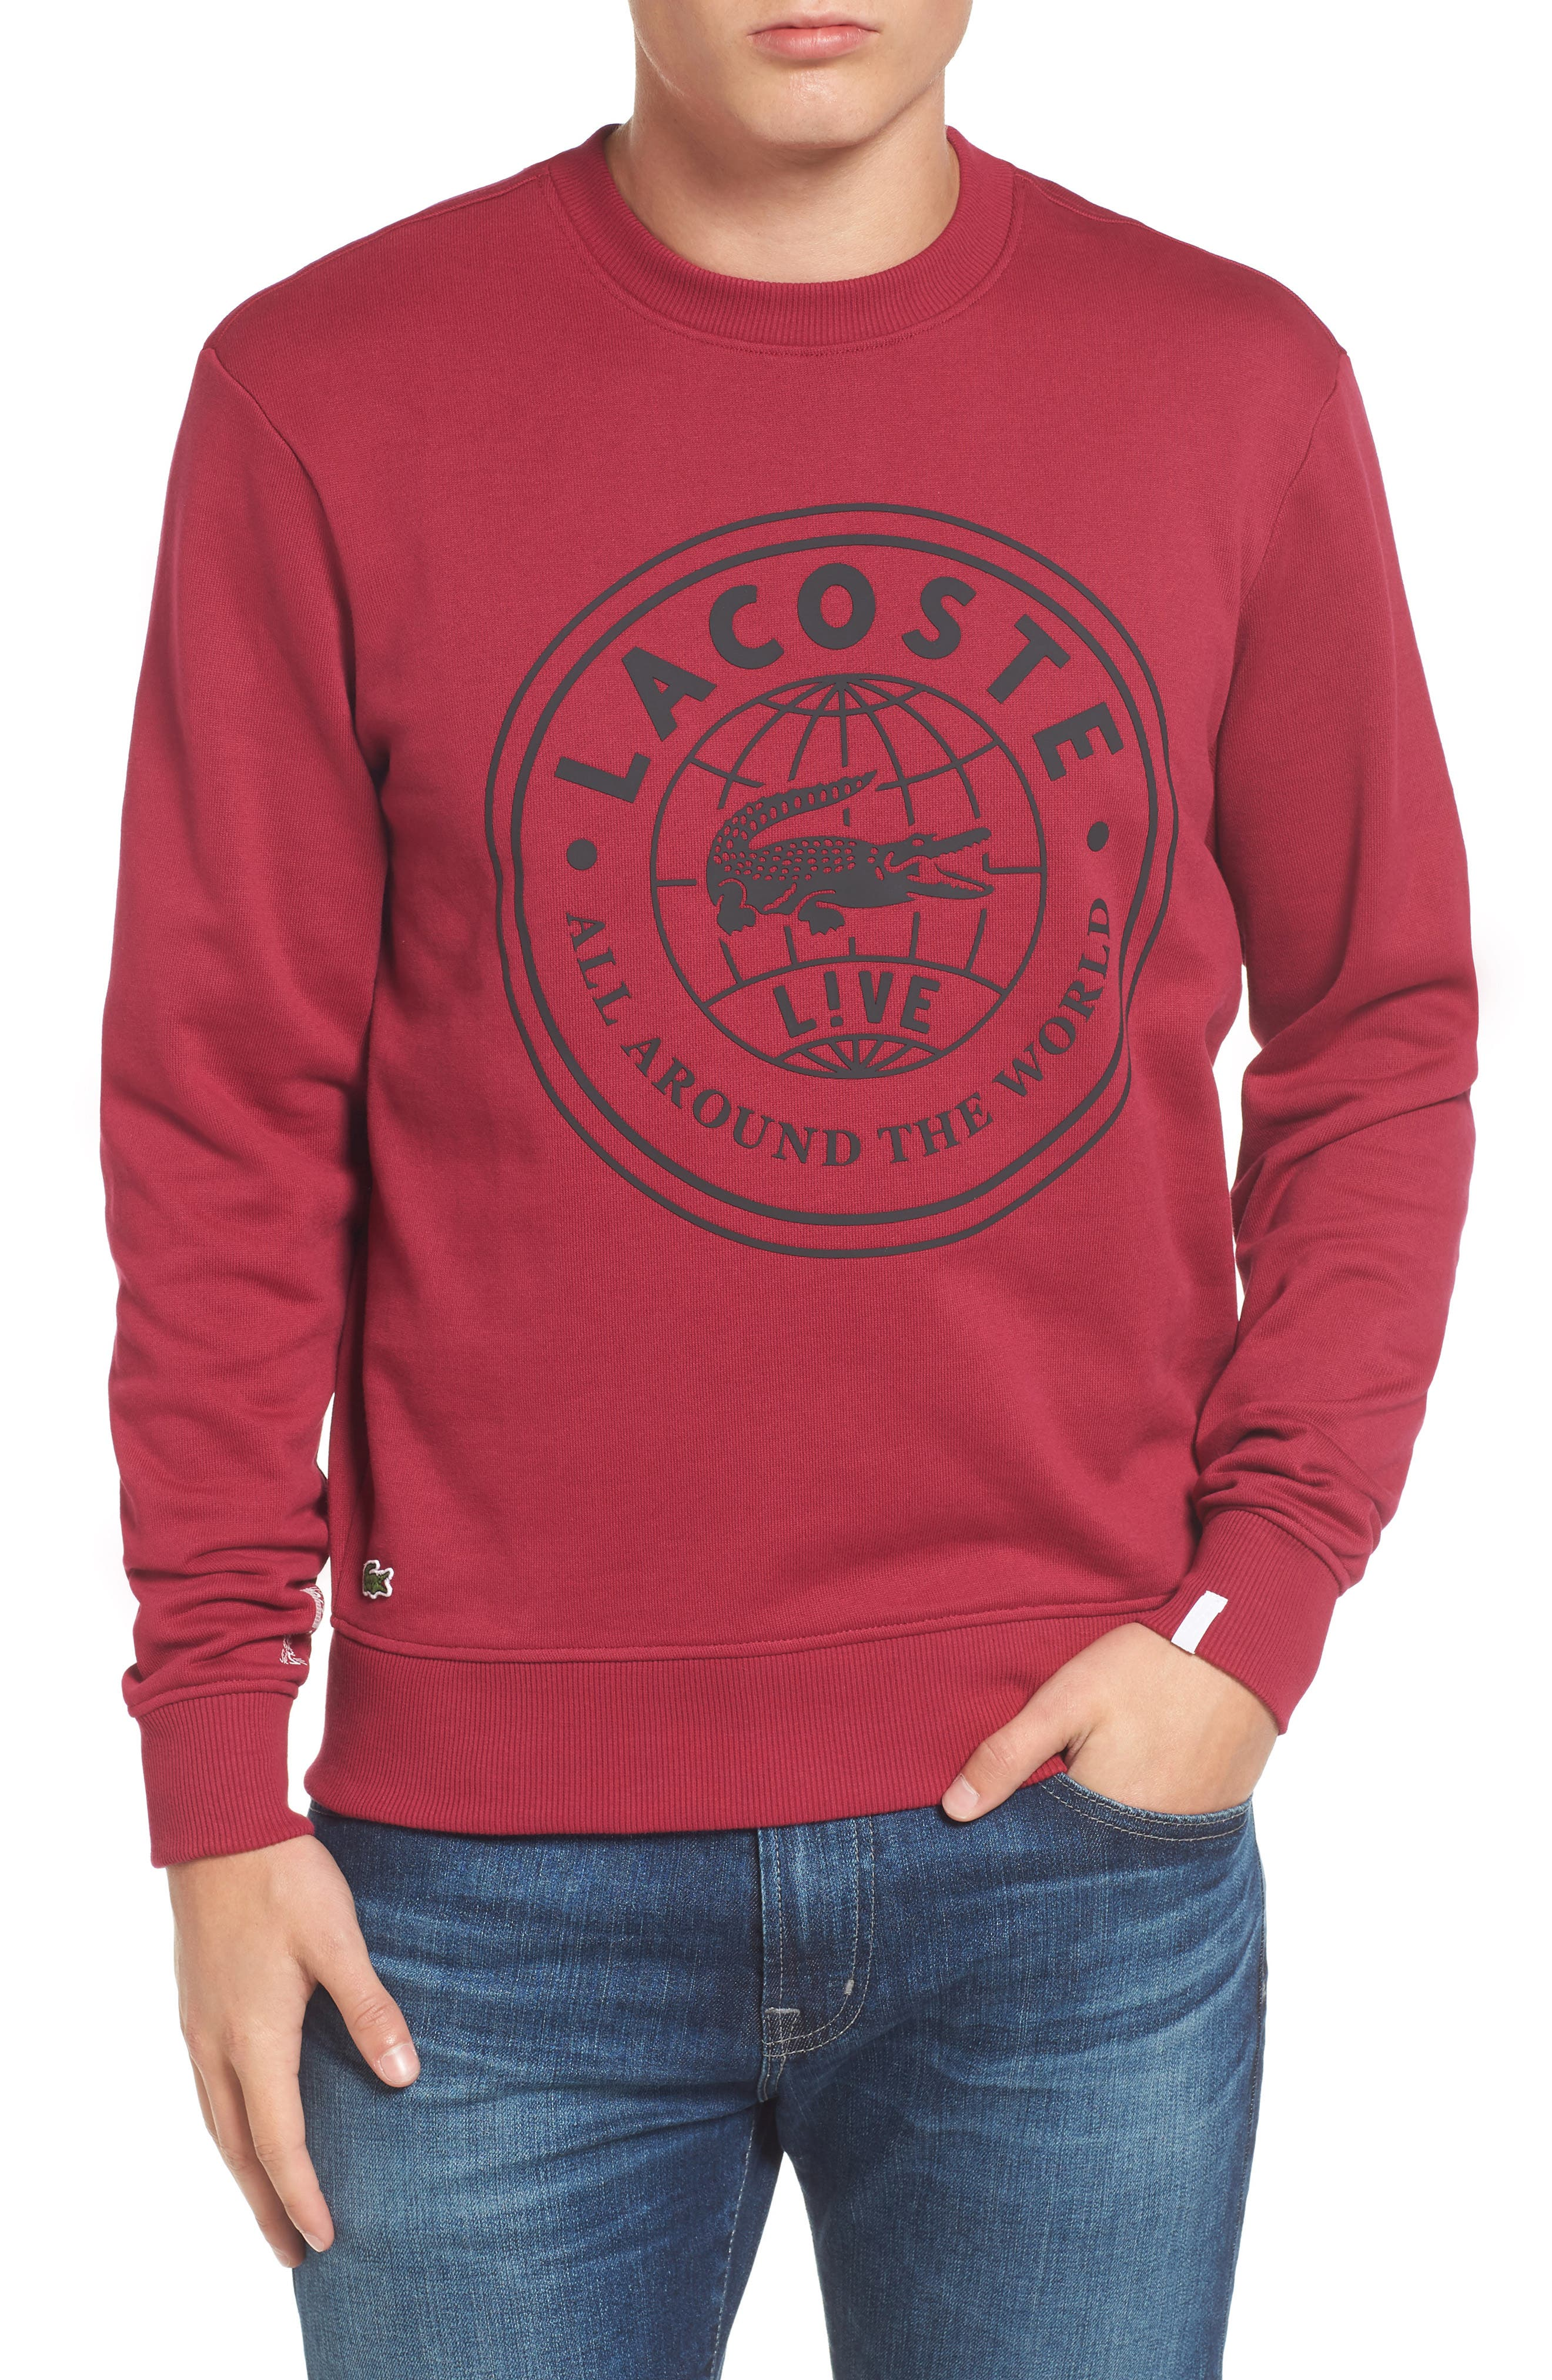 Lacoste Molleton Worldwide Sweatshirt